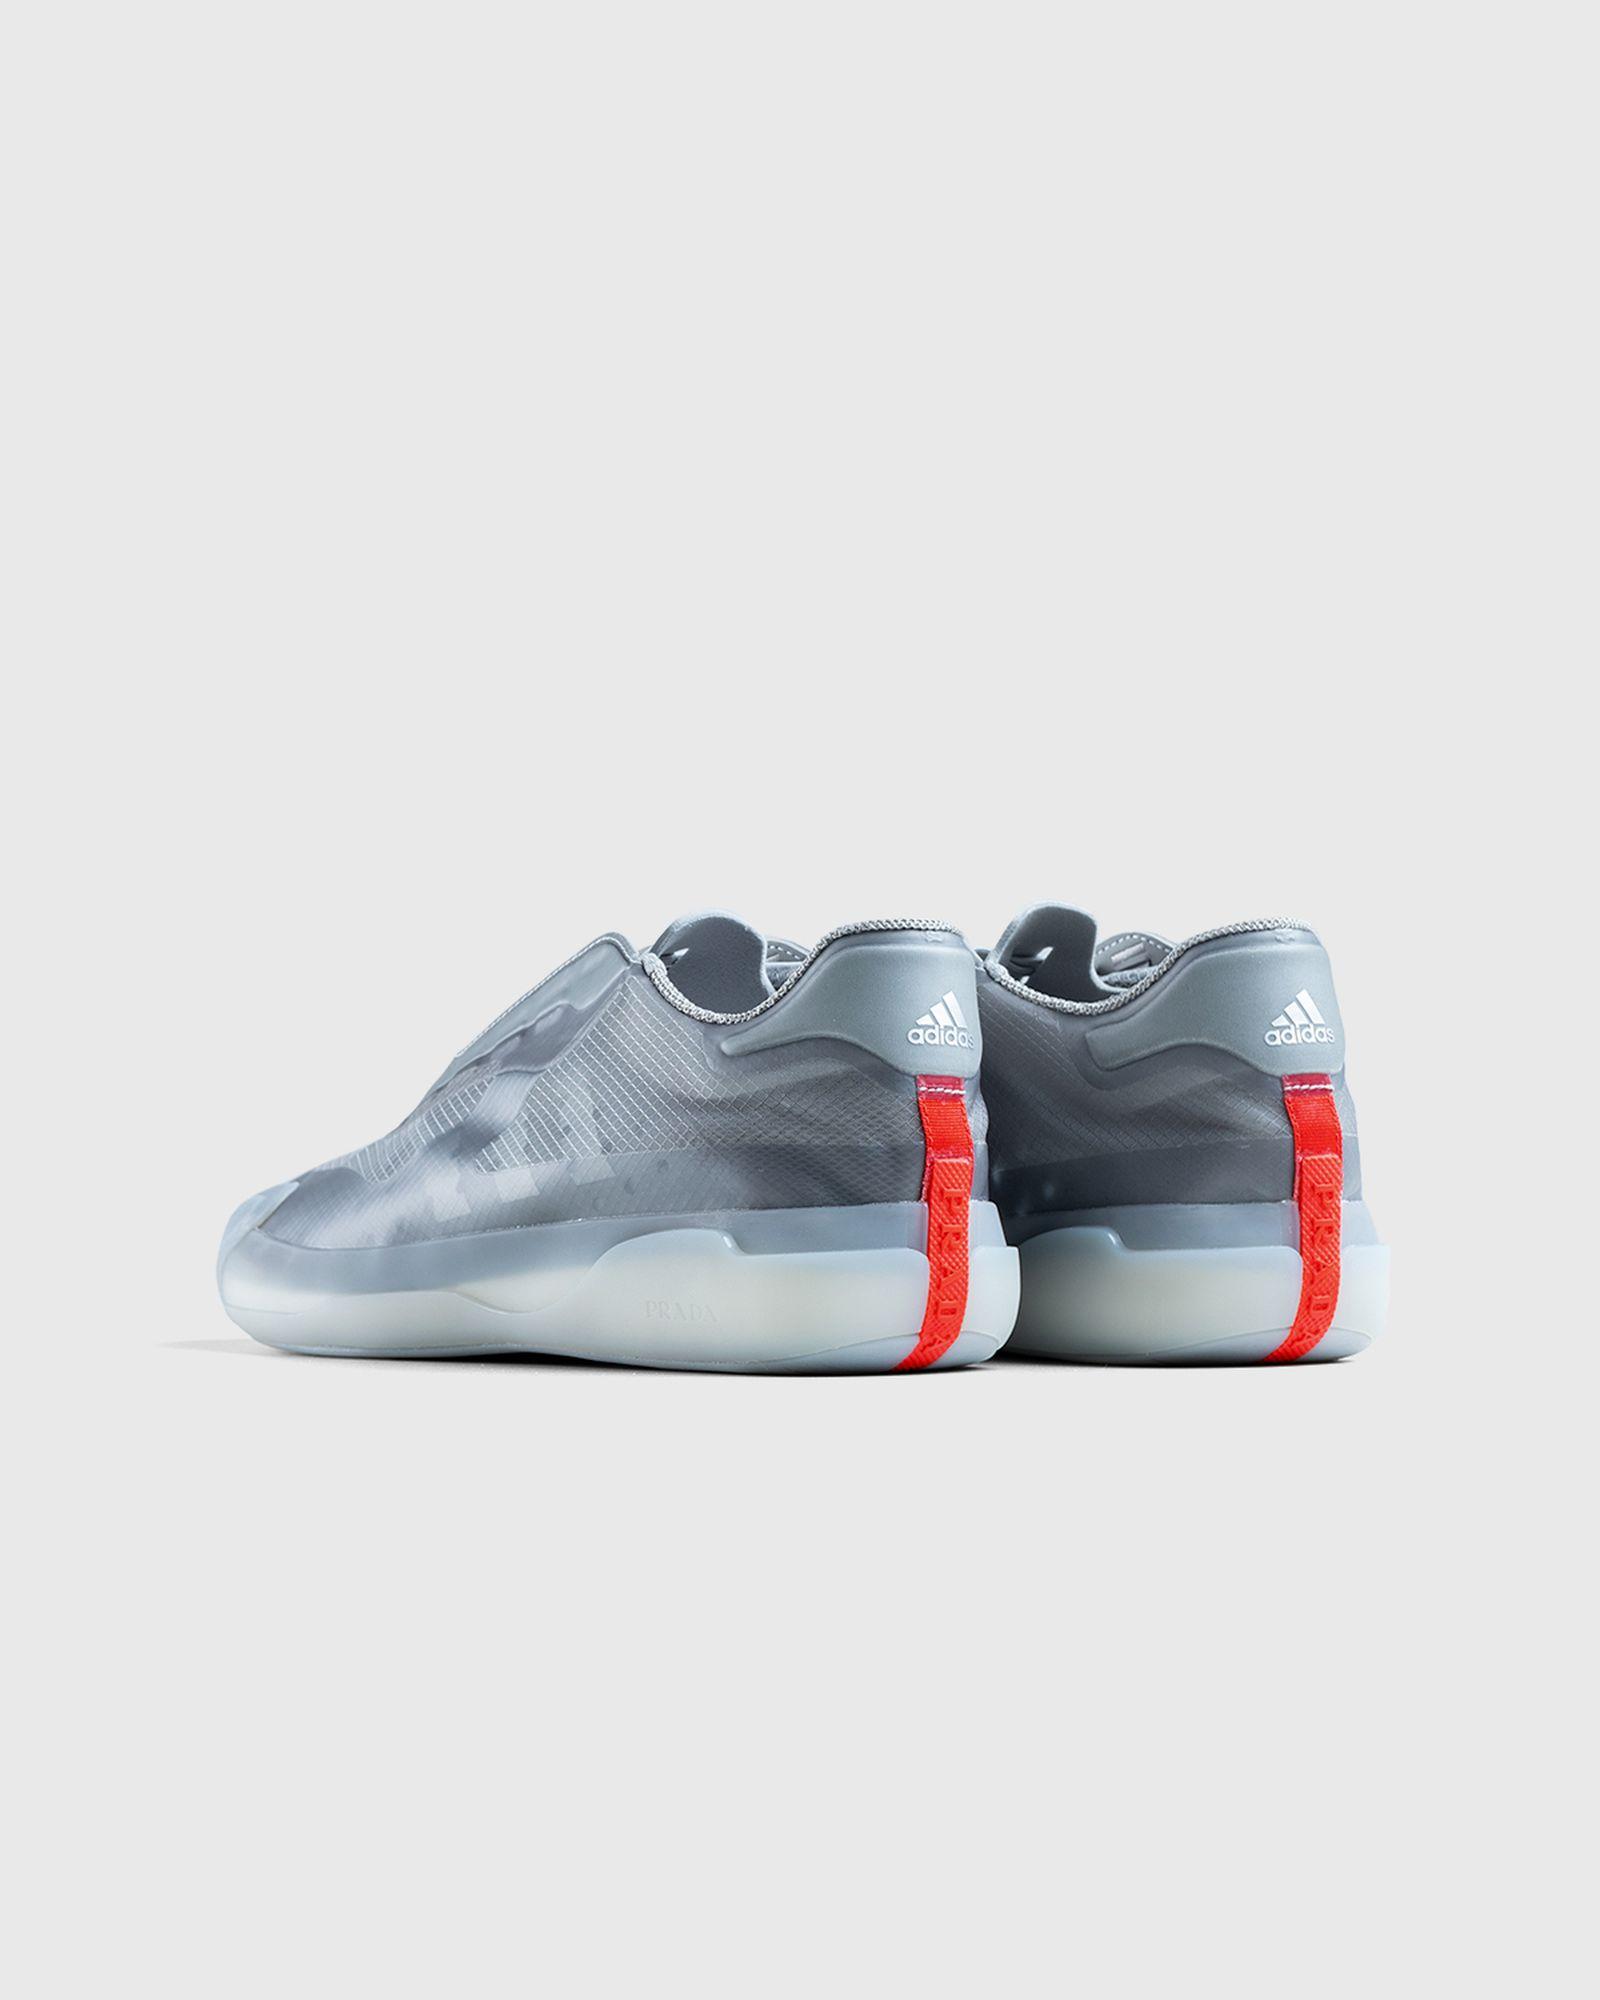 adidas-prada-luna-rossa-replica-grey-release-date-price-3